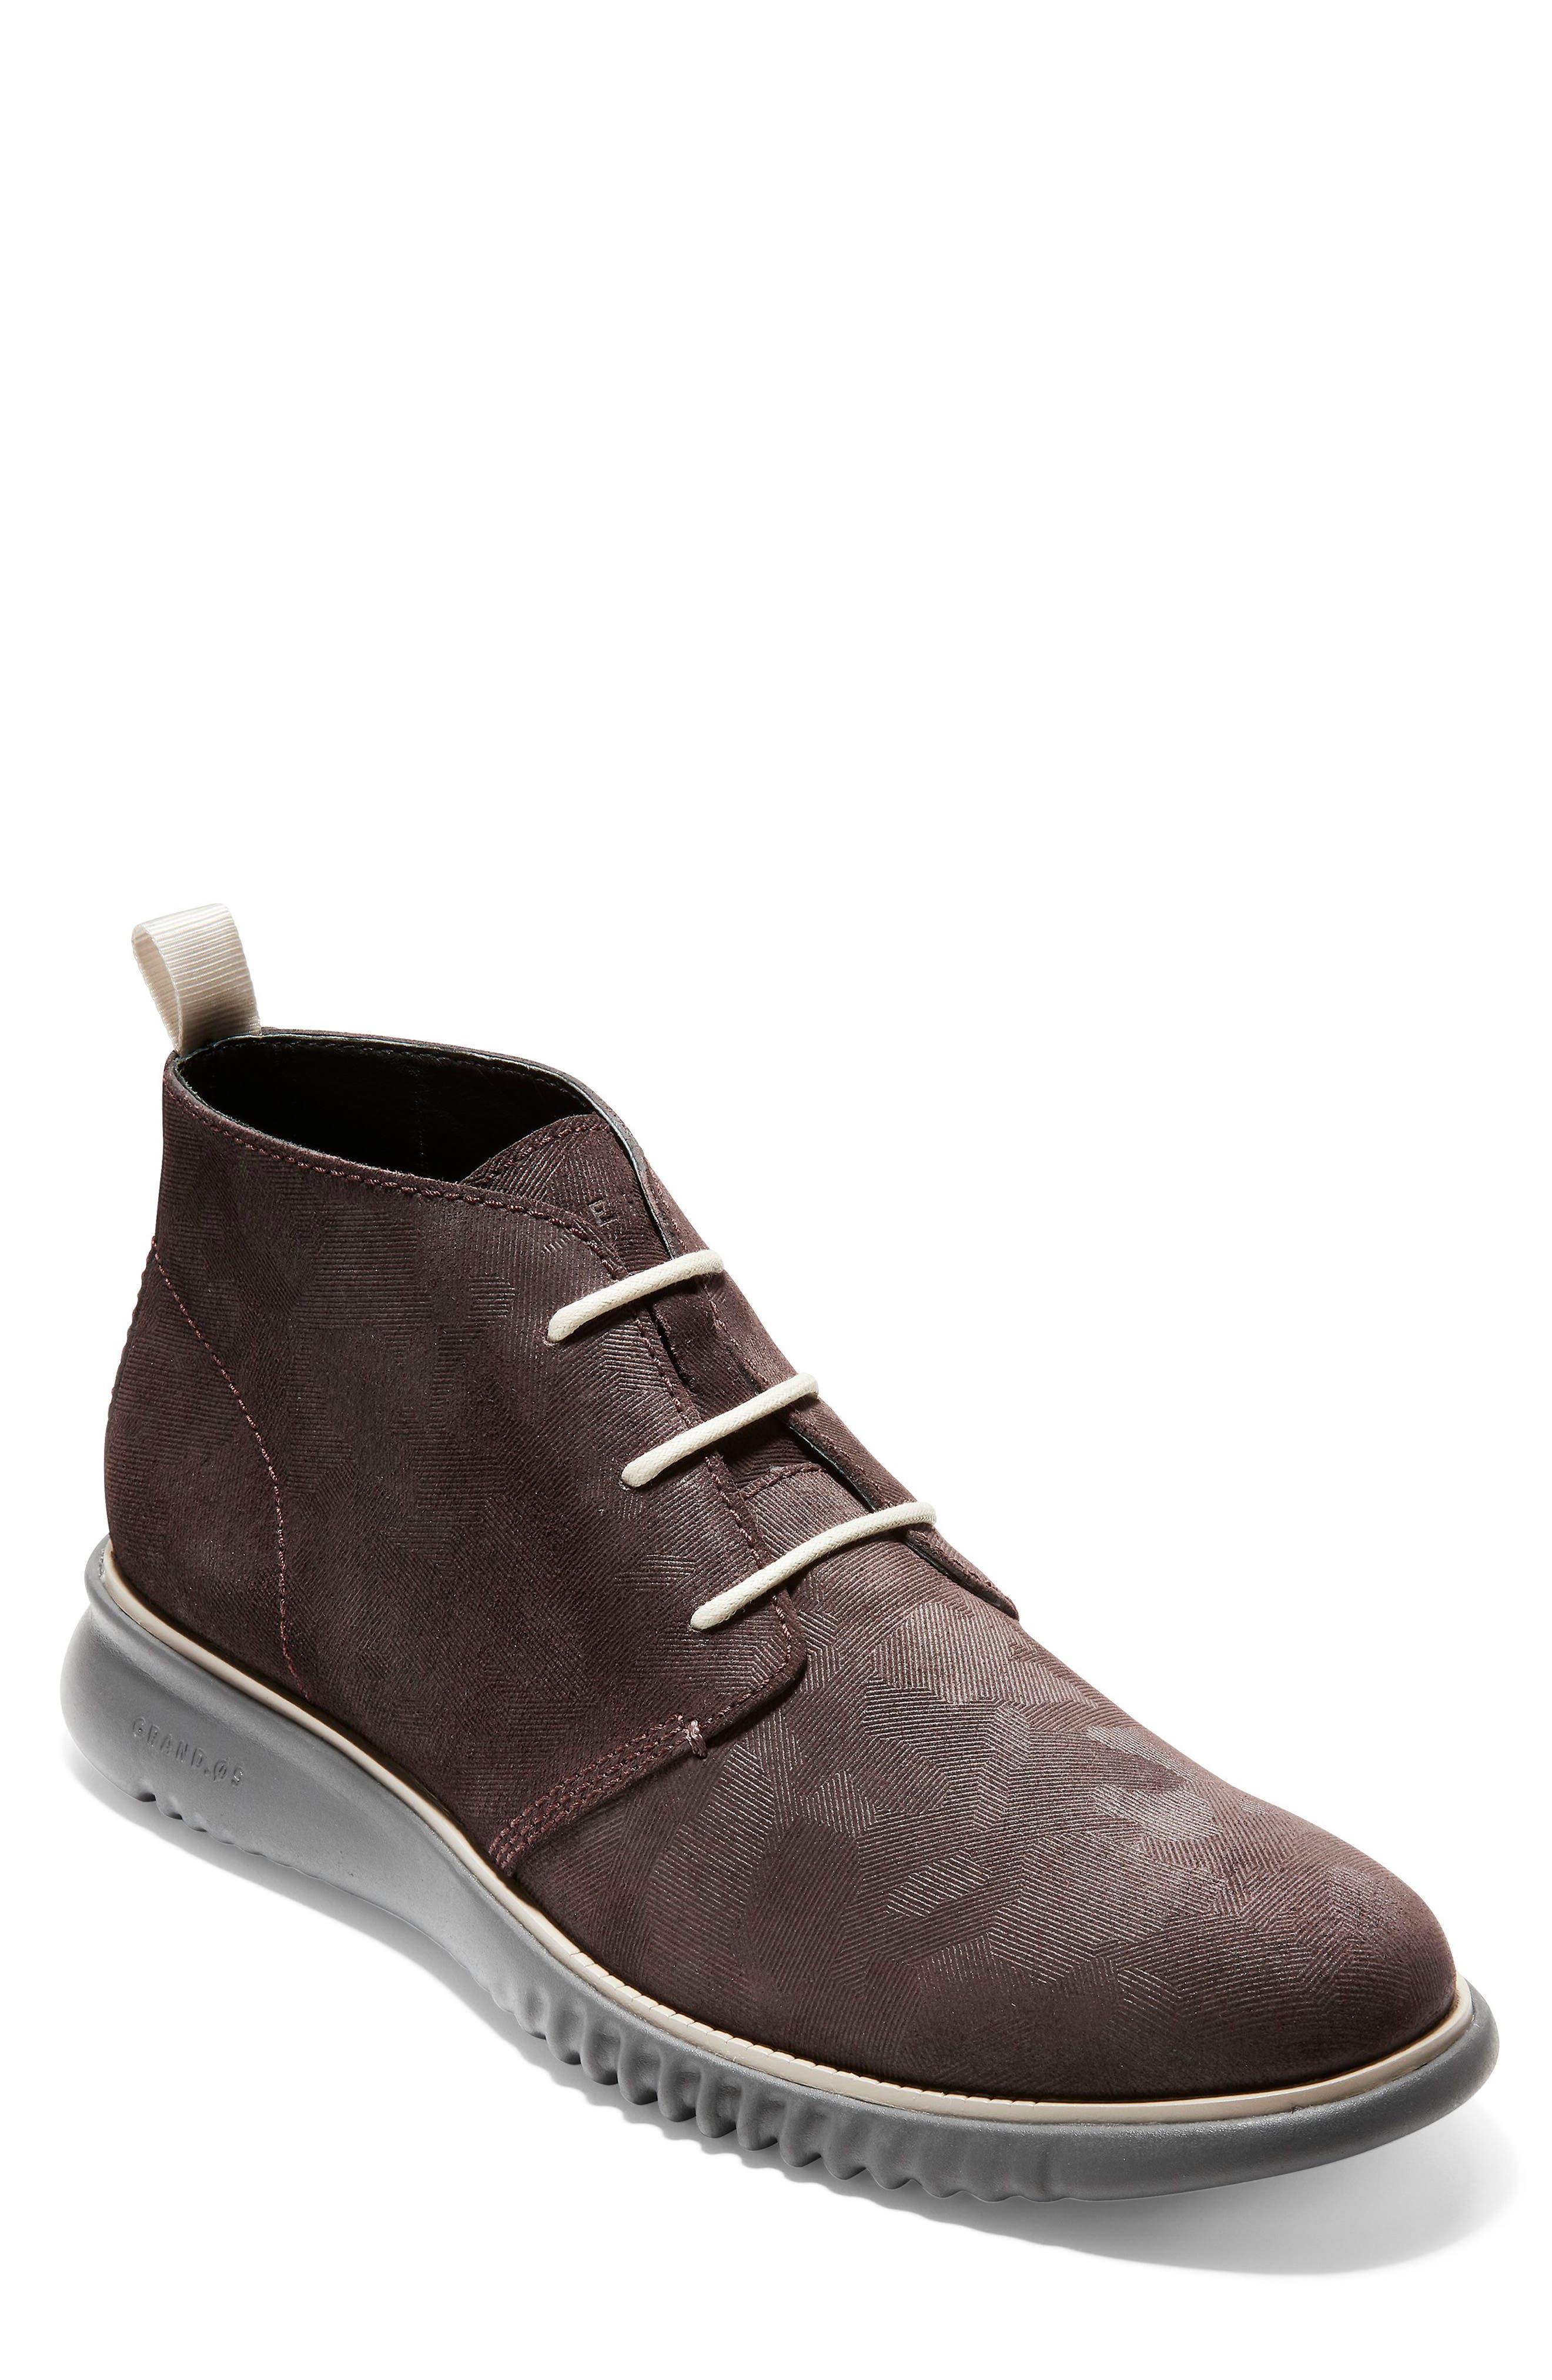 2.Zerogrand Chukka Boot,                         Main,                         color, BLACK/ WALNUT SUEDE